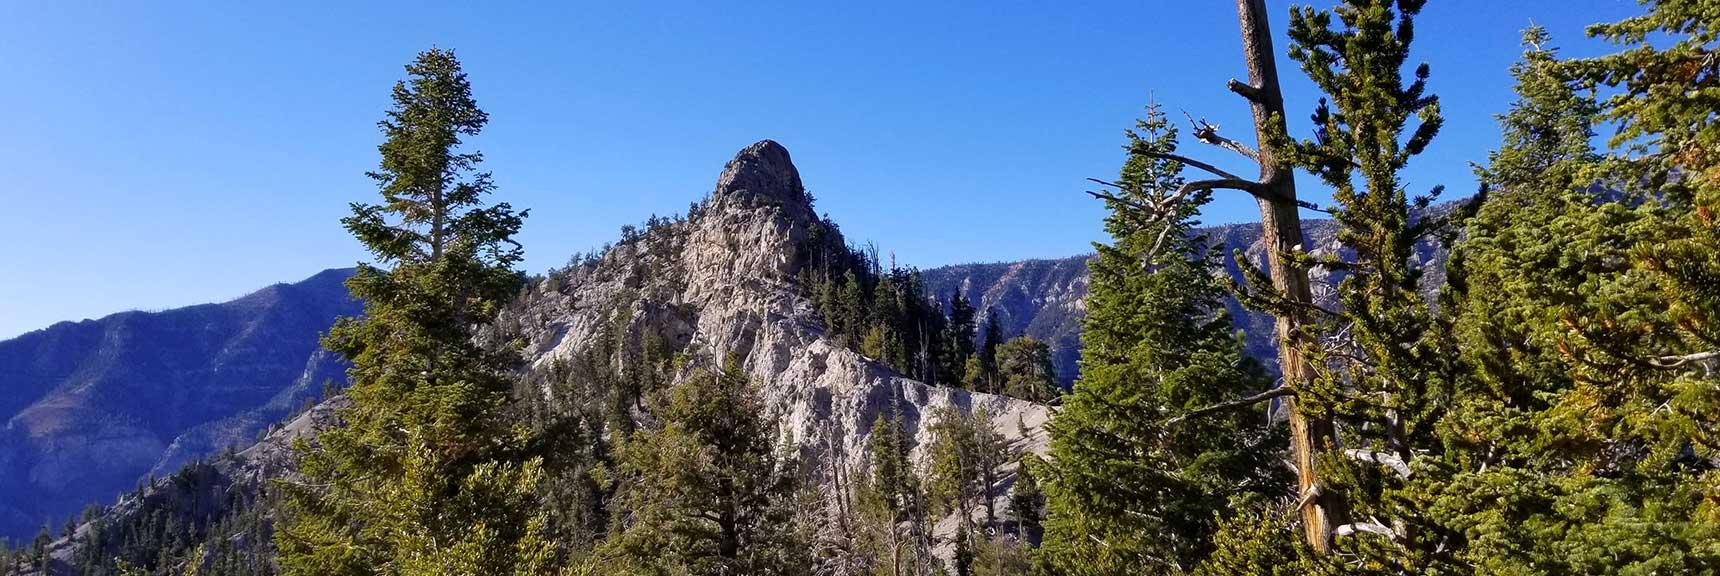 Cockscomb Peak and Ridge Wilderness Circuit in Mt. Charleston Wilderness, Nevada